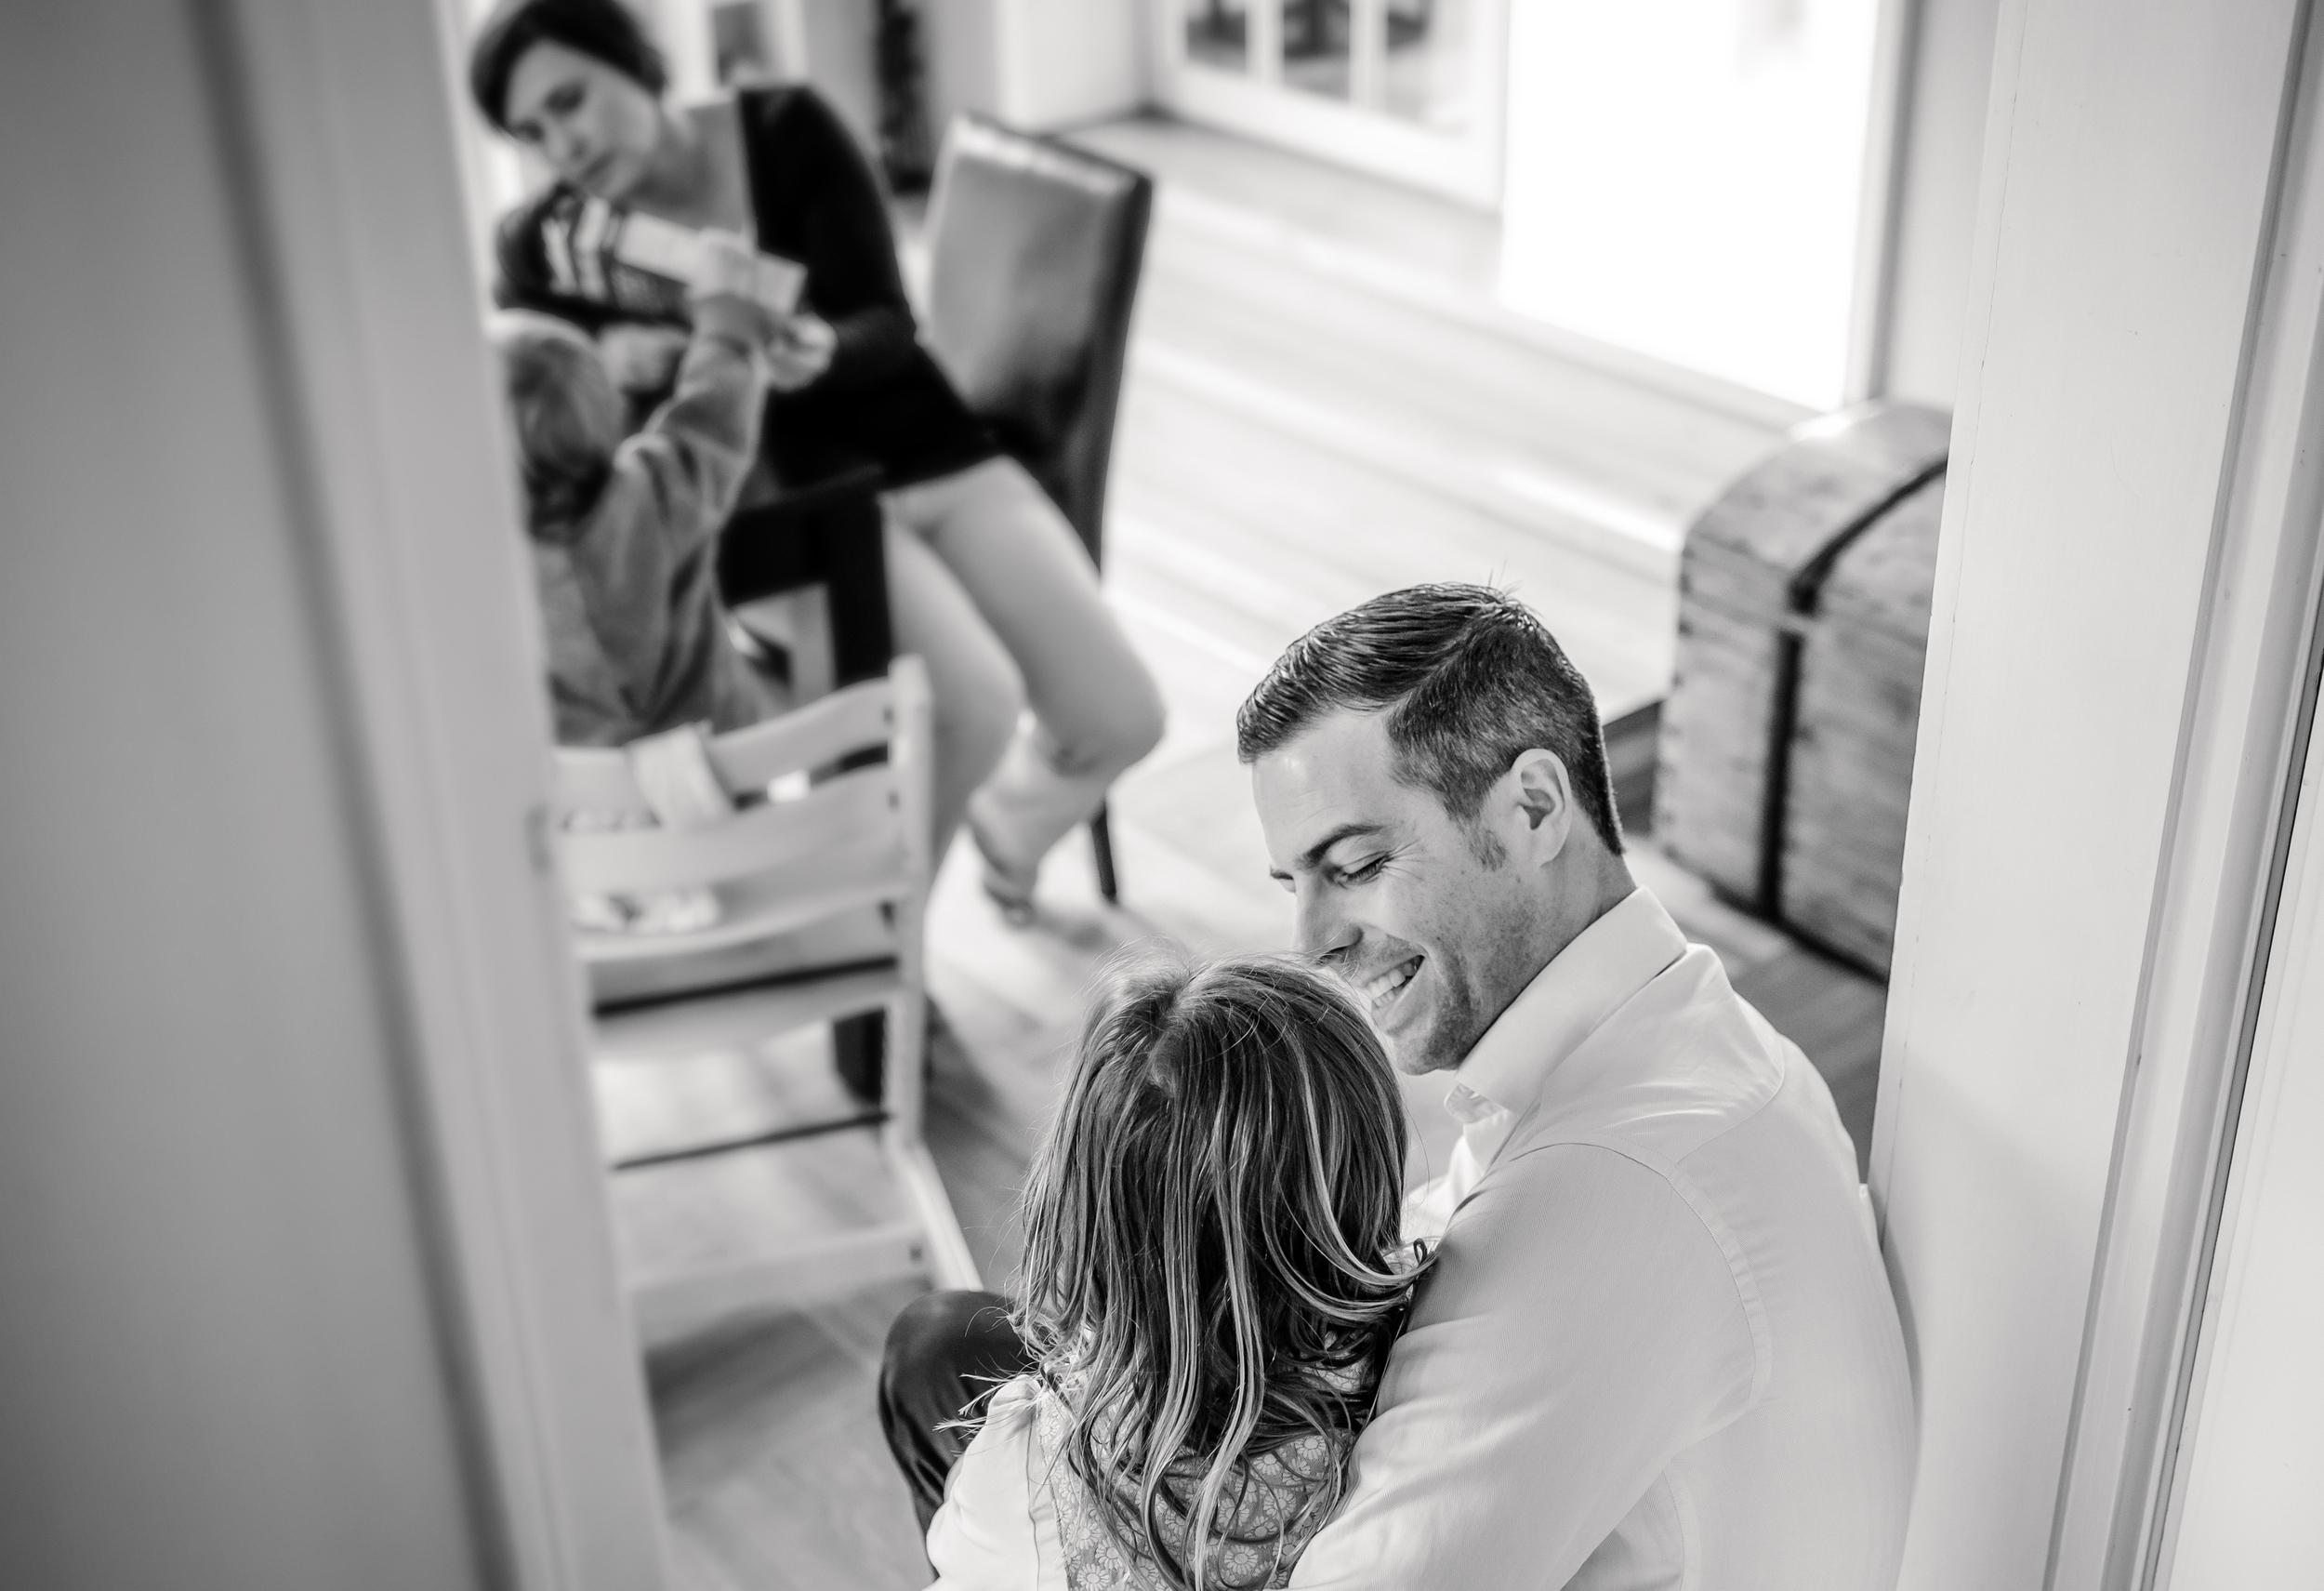 familienfotos-fotoshooting-koeln